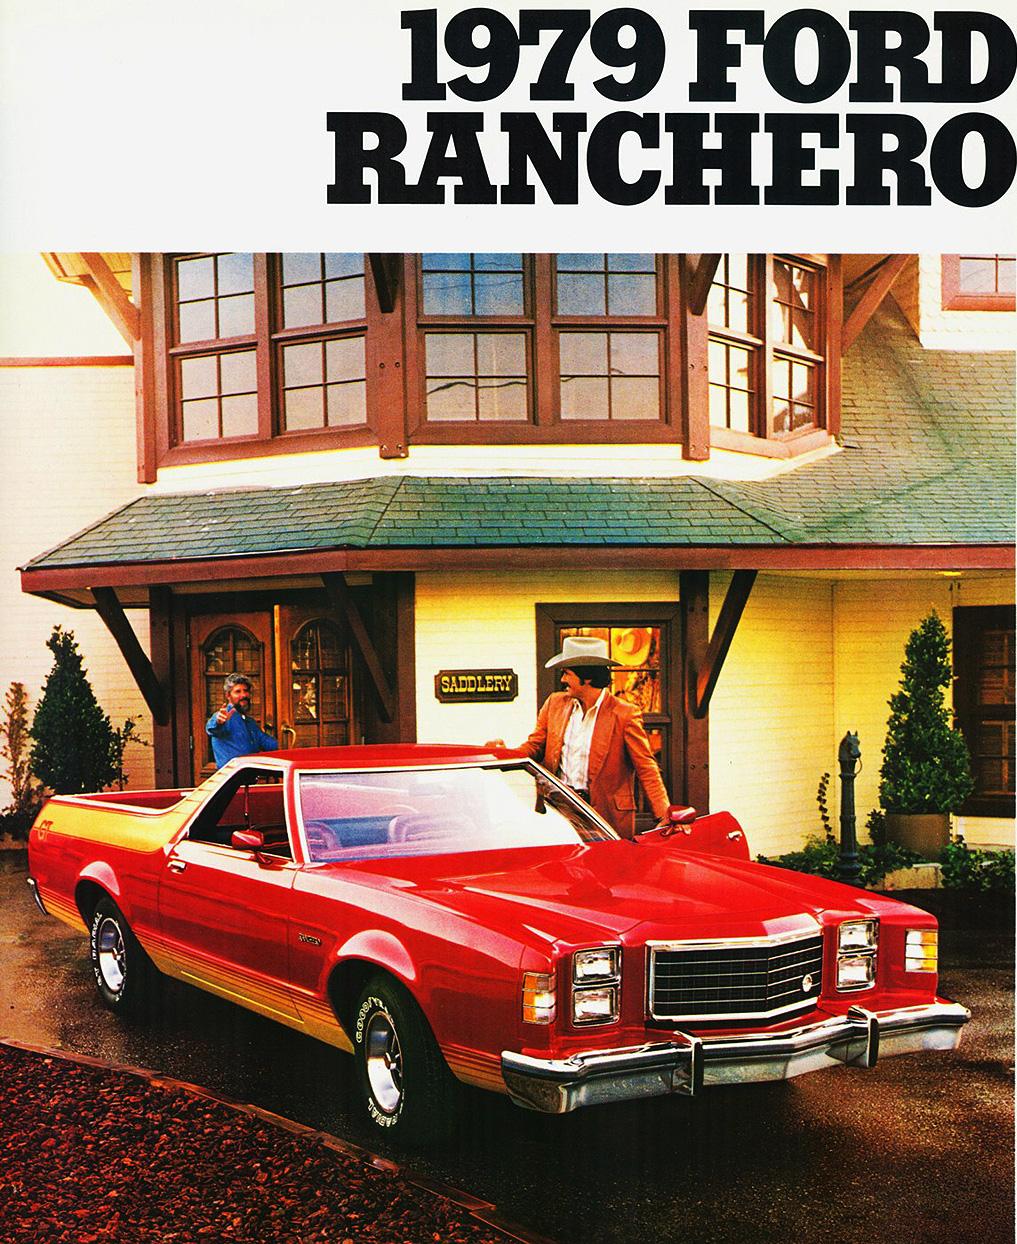 1979 Ford Ranchero ad